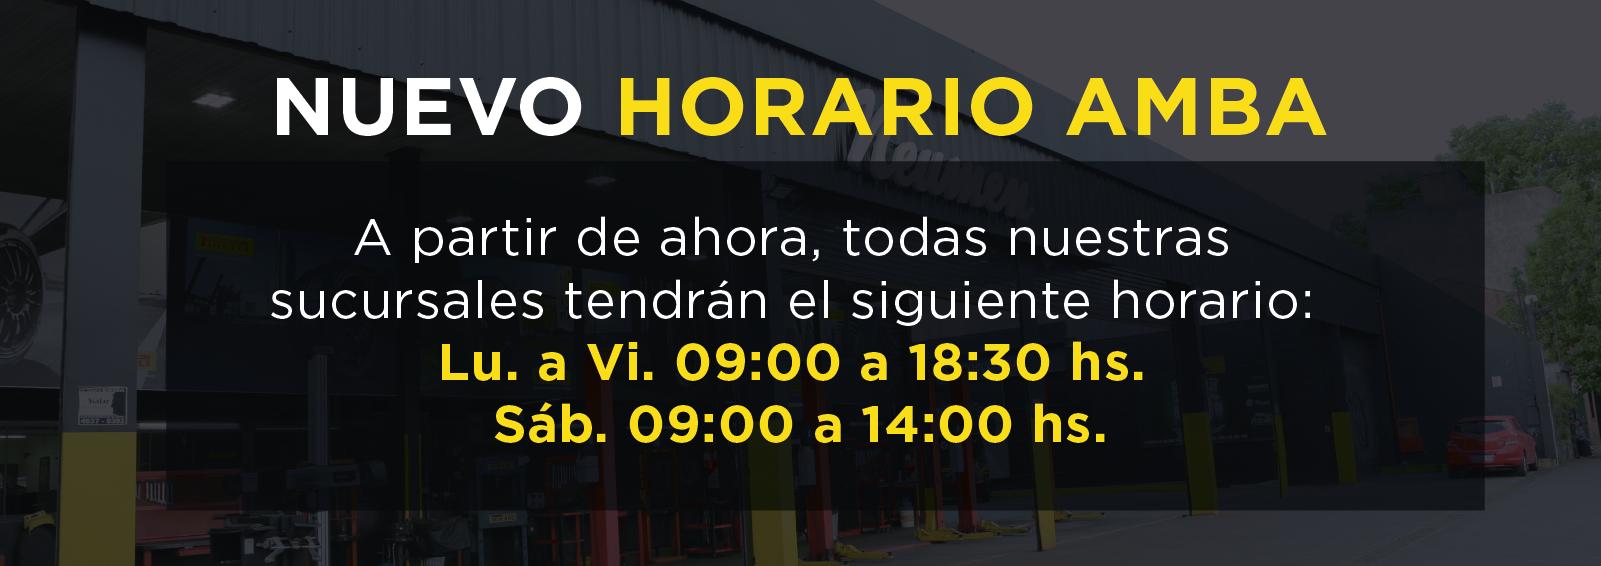 Nuevo Horario 9 a 18.30 hrs